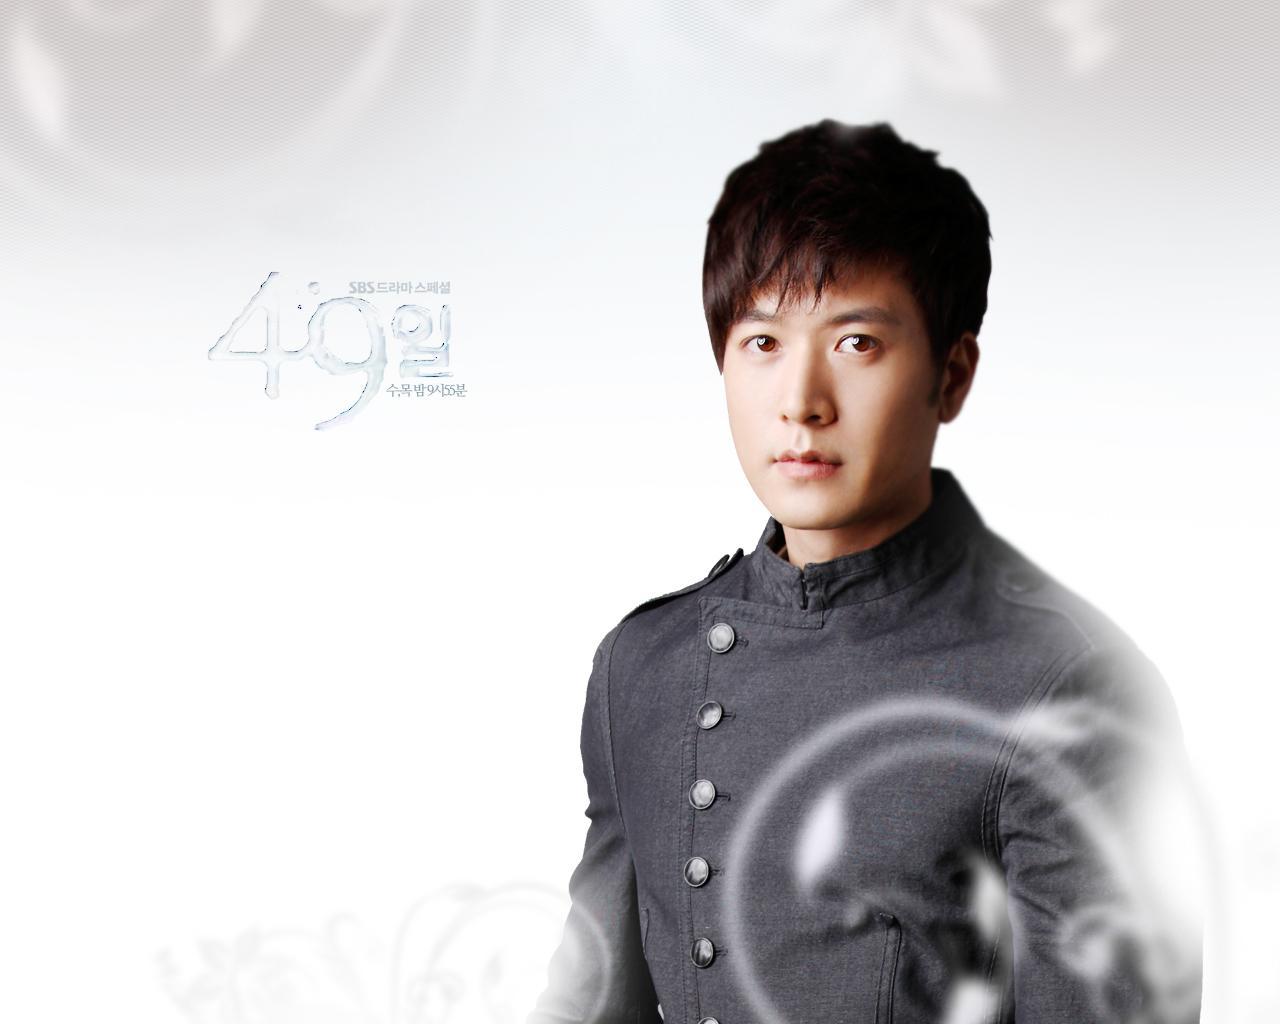 http://korean-cute.sosugary.com/albums/userpics/10001/123.jpg